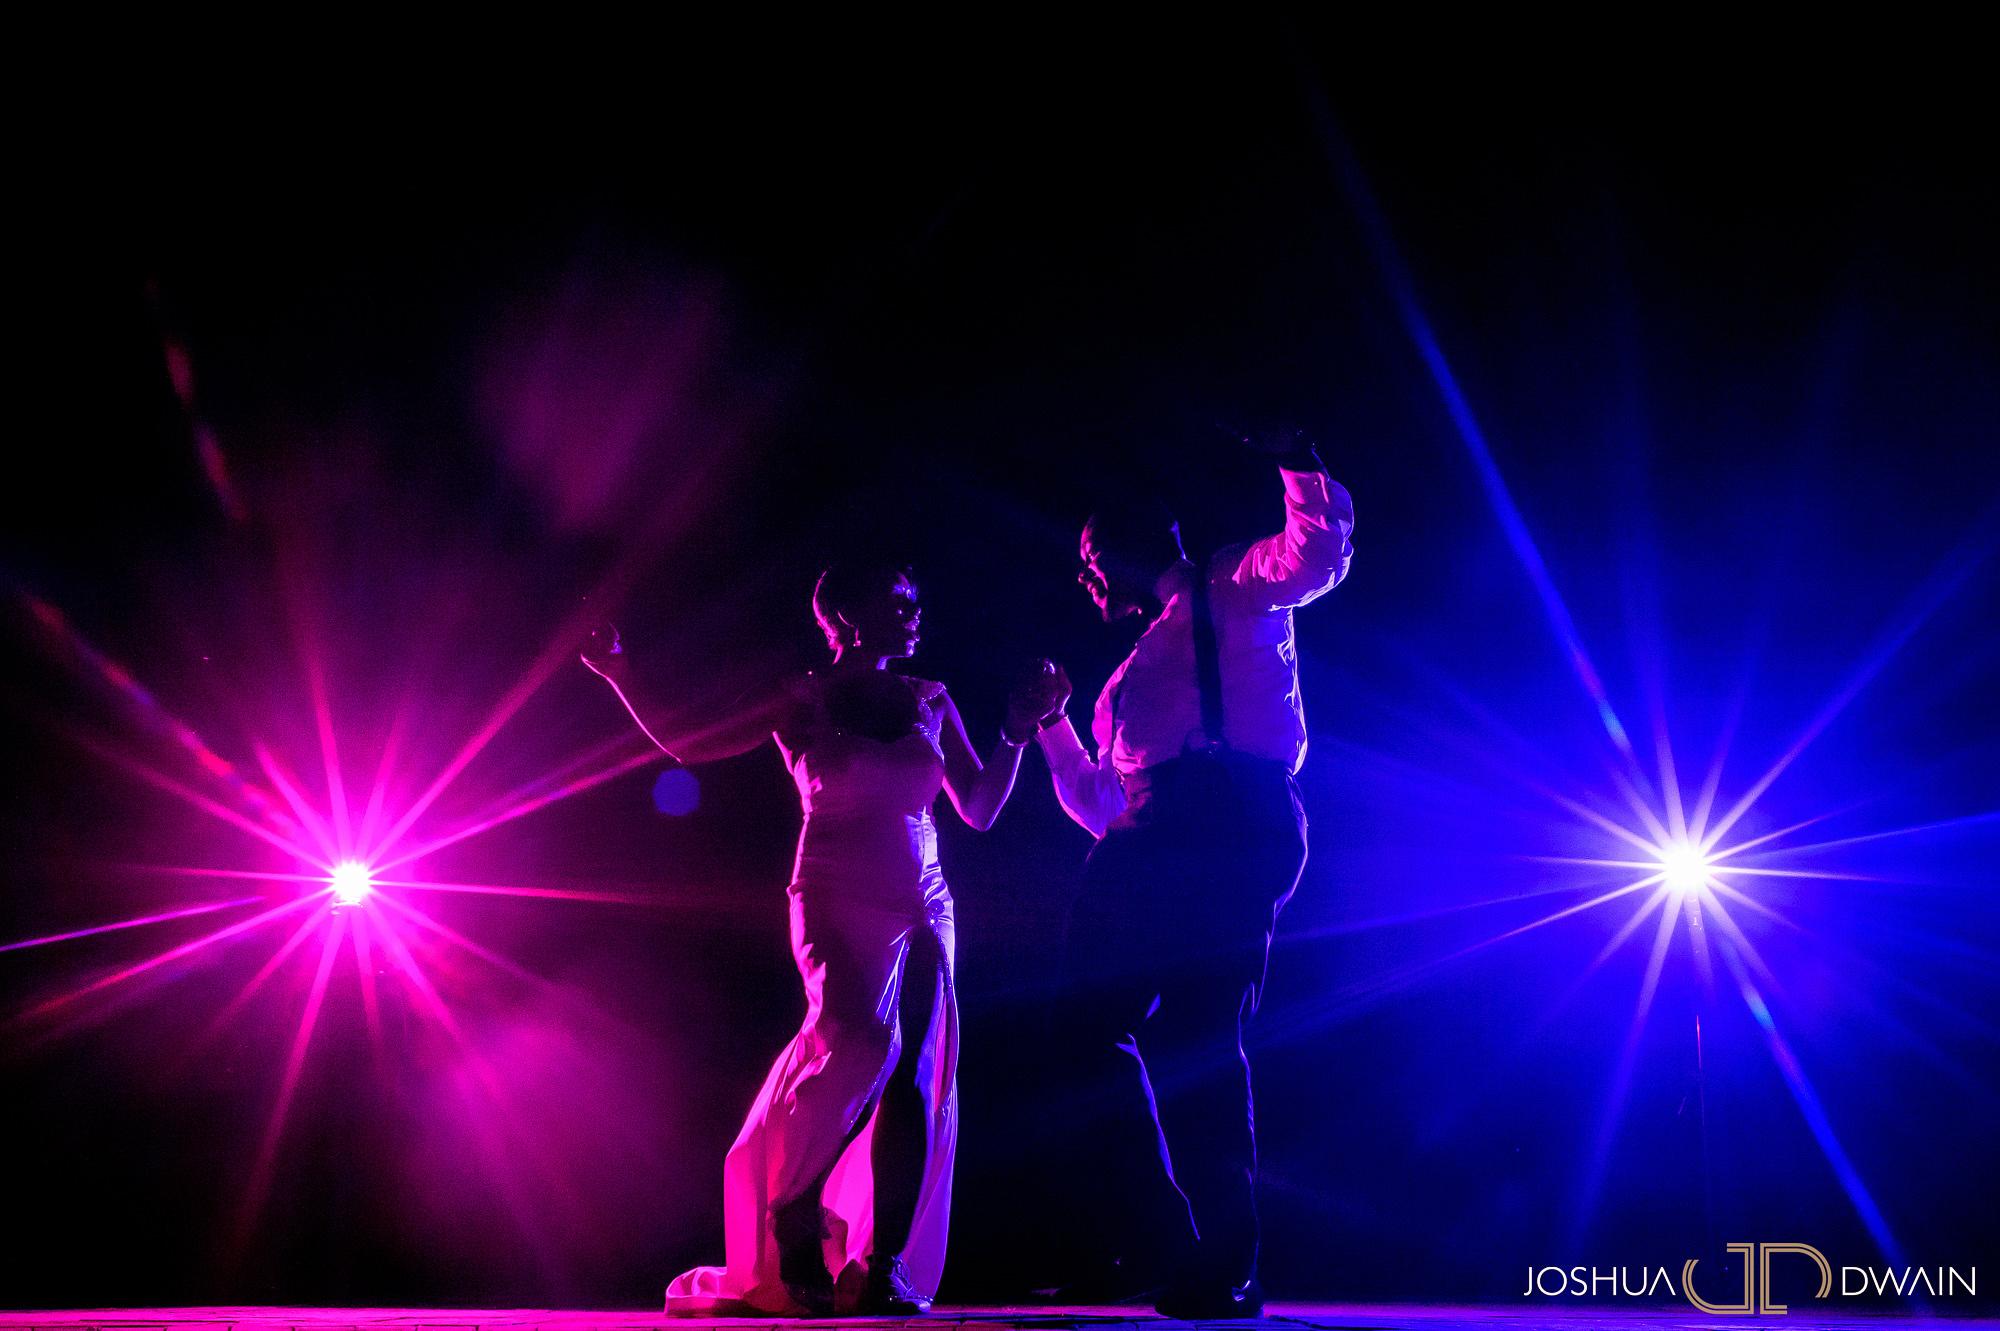 joshua-dwain-weddings-gallery-best-wedding-photographers-us-061